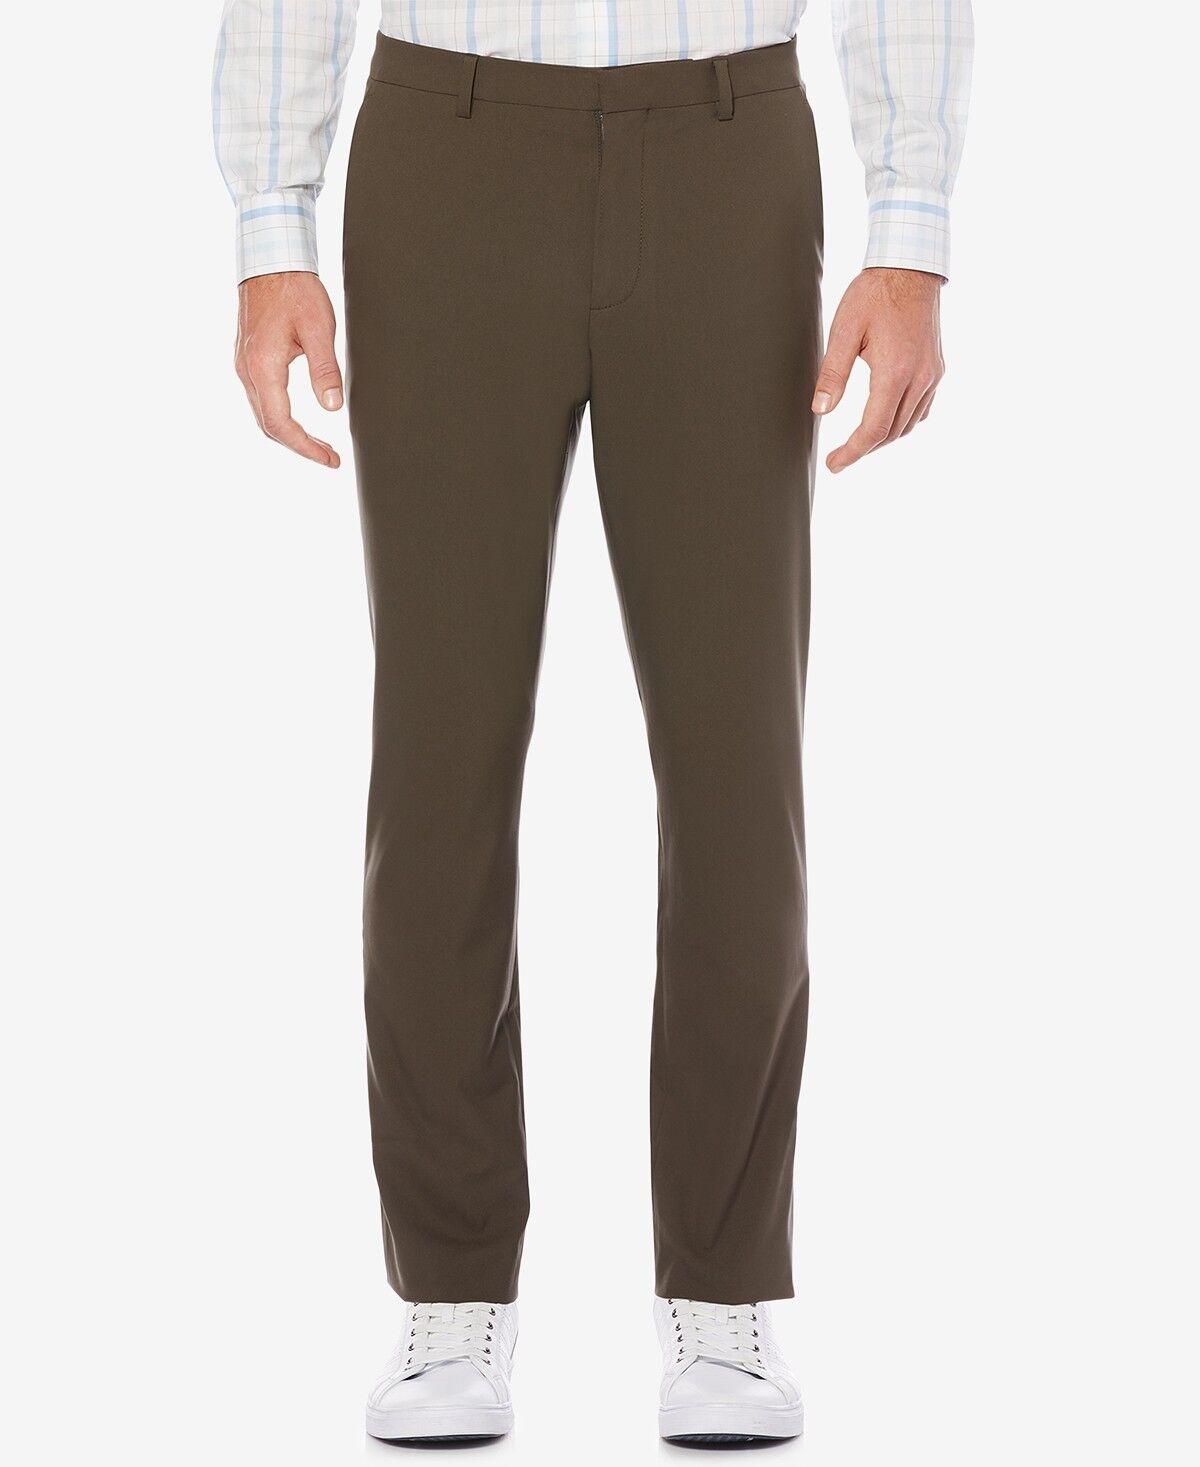 PERRY ELLIS PORTFOLIO MEN BROWN FLAT FRONT SLIM FIT DRESS PANTS 32 W 29 L